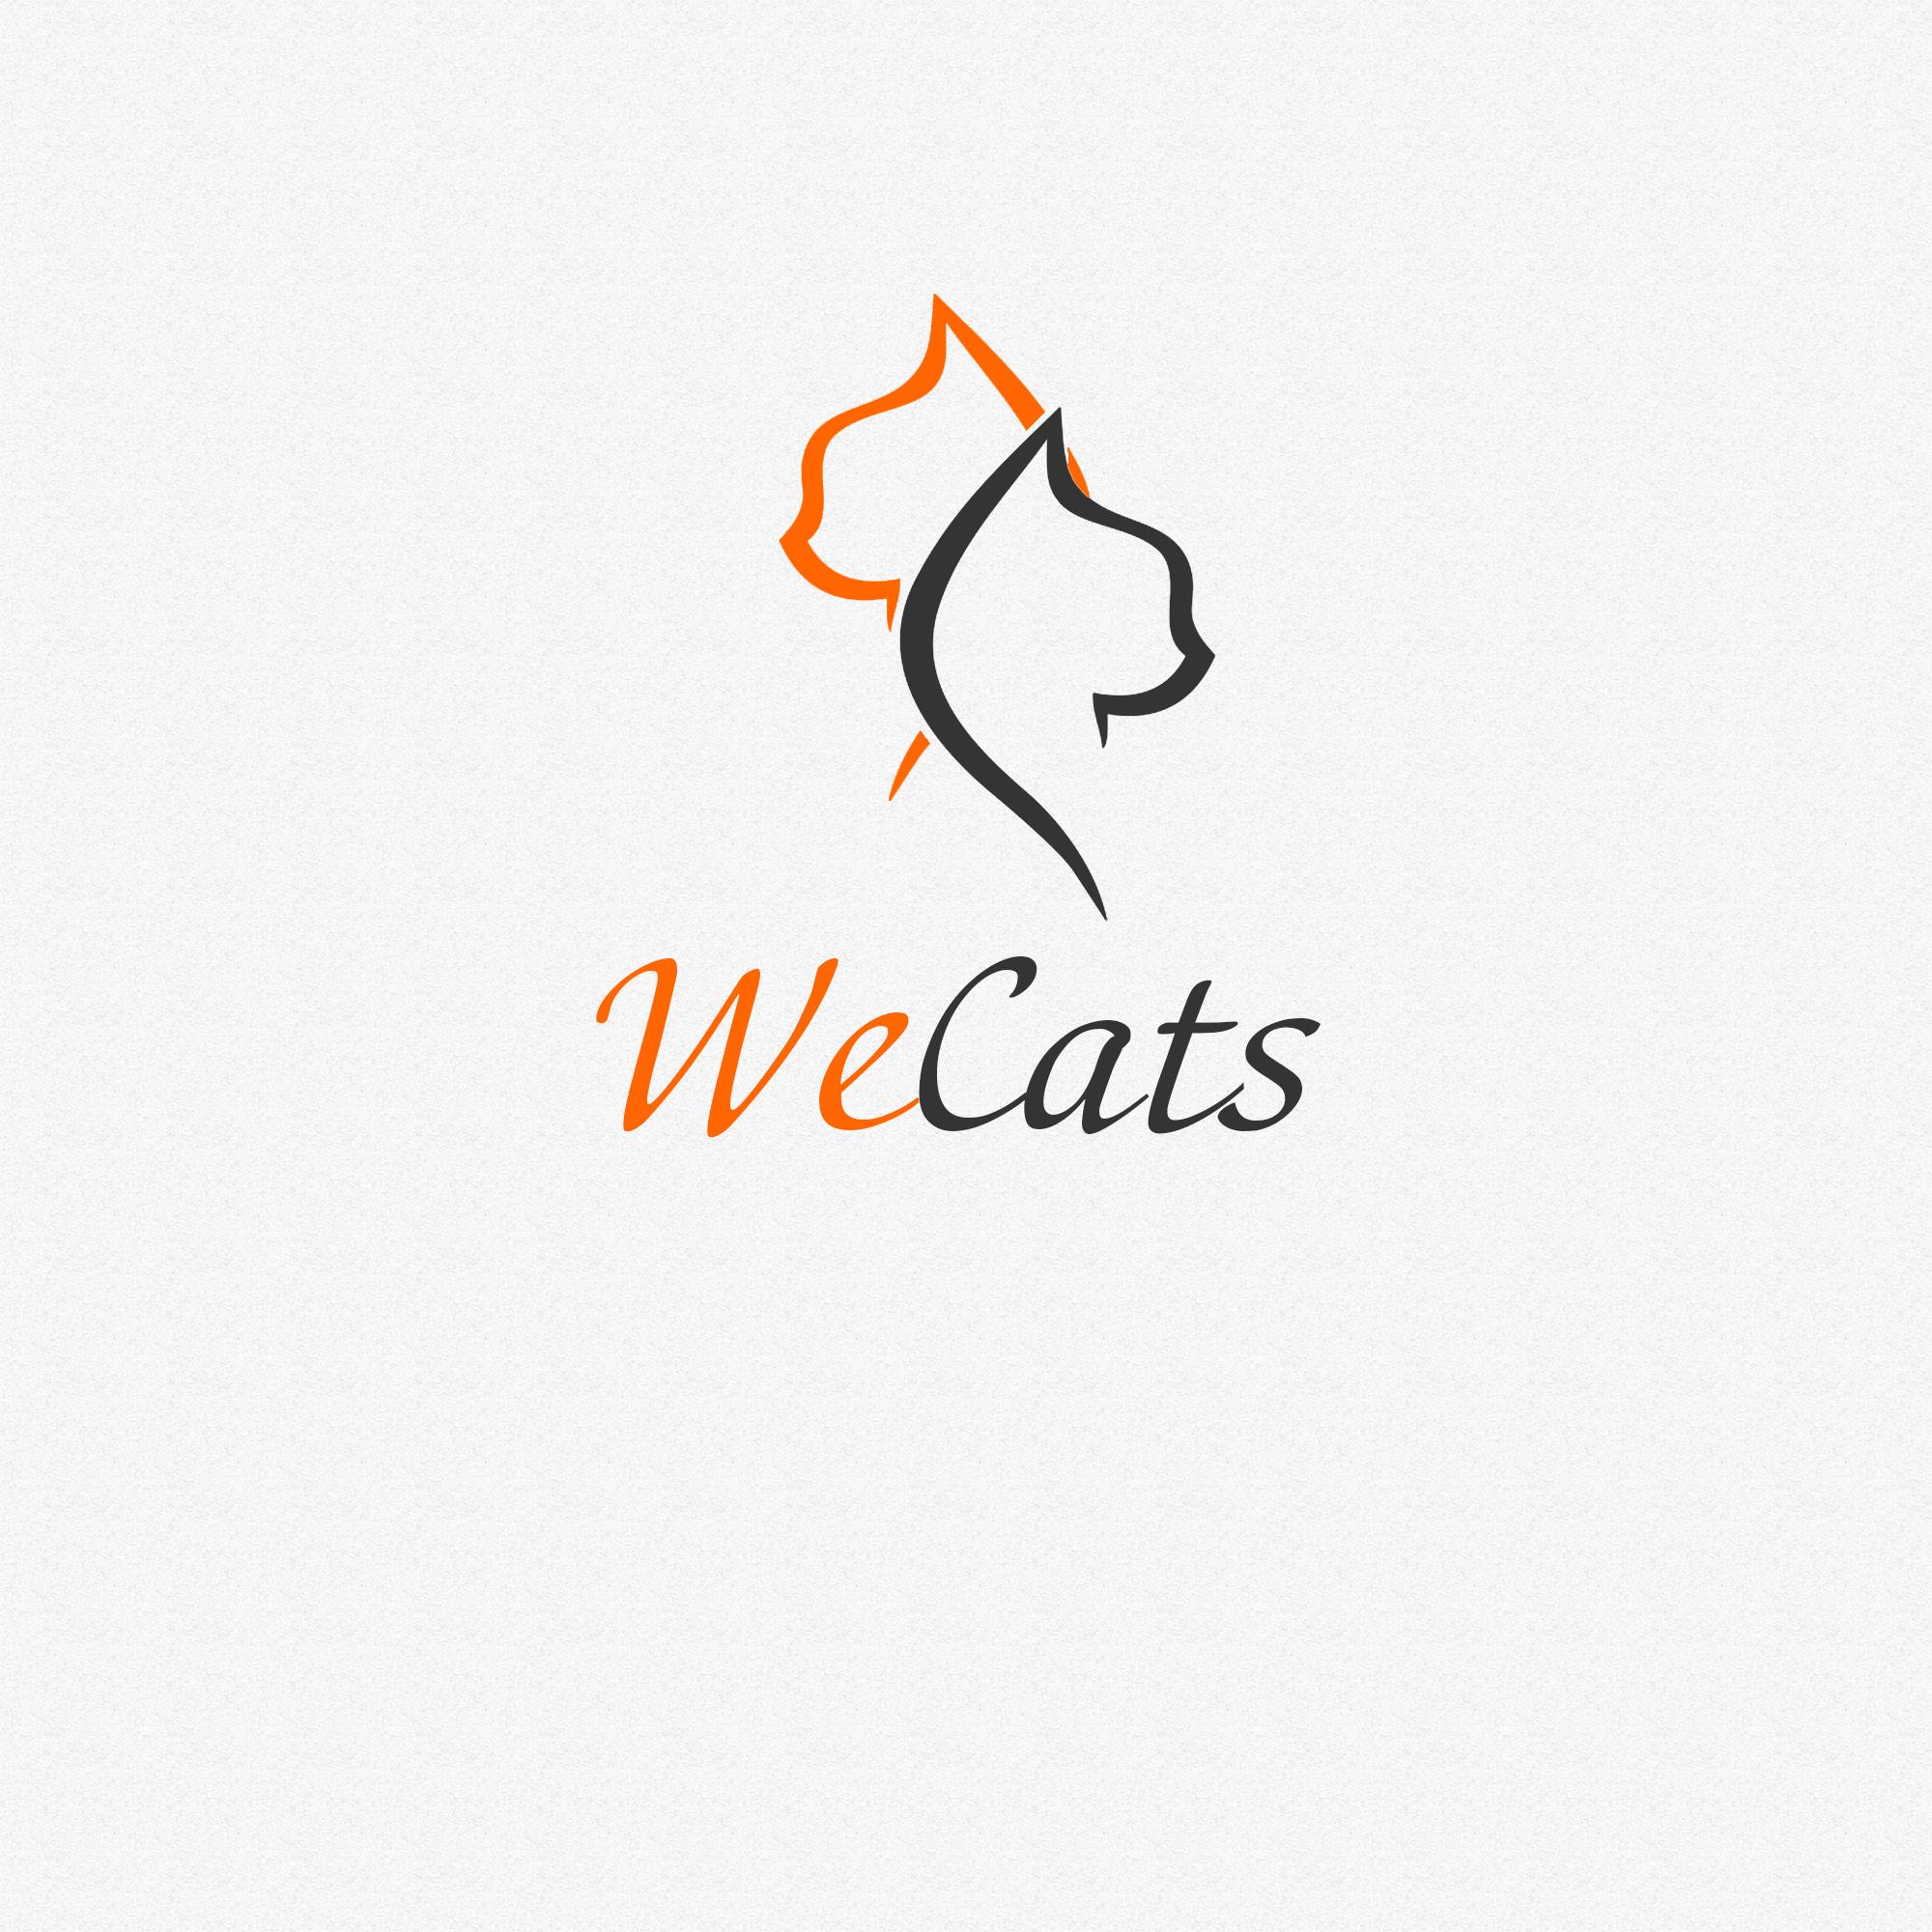 Создание логотипа WeCats фото f_3235f19c52927c88.jpg